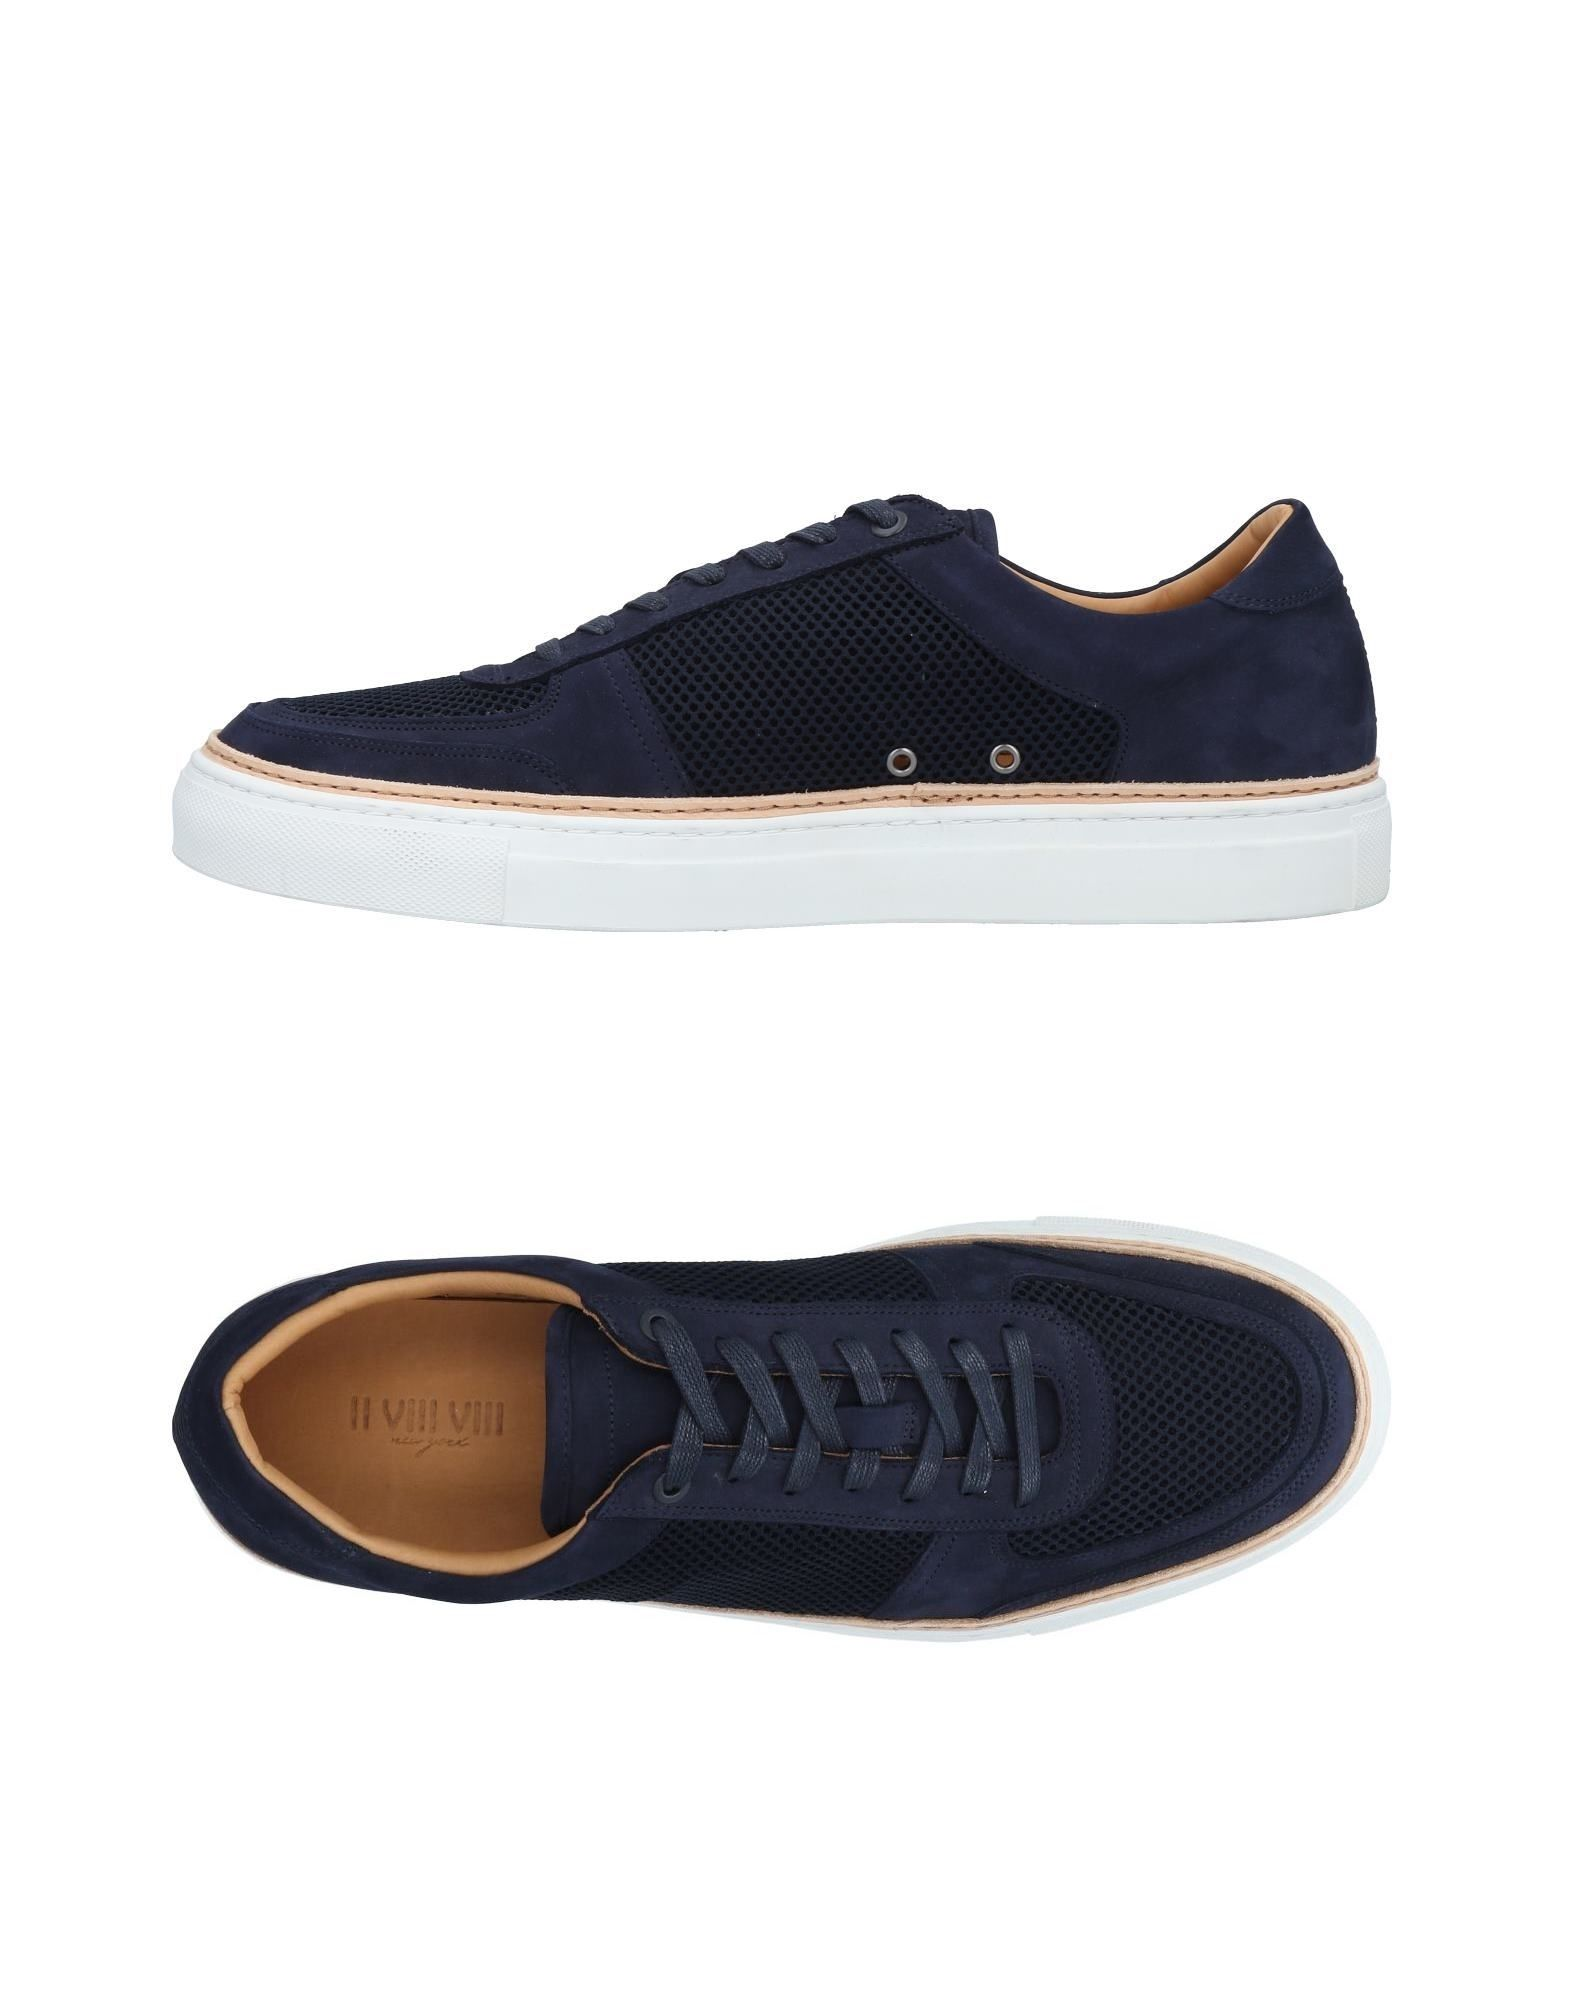 Sneakers Ii Viii Viii - N° 288 Uomo - 11488648WW